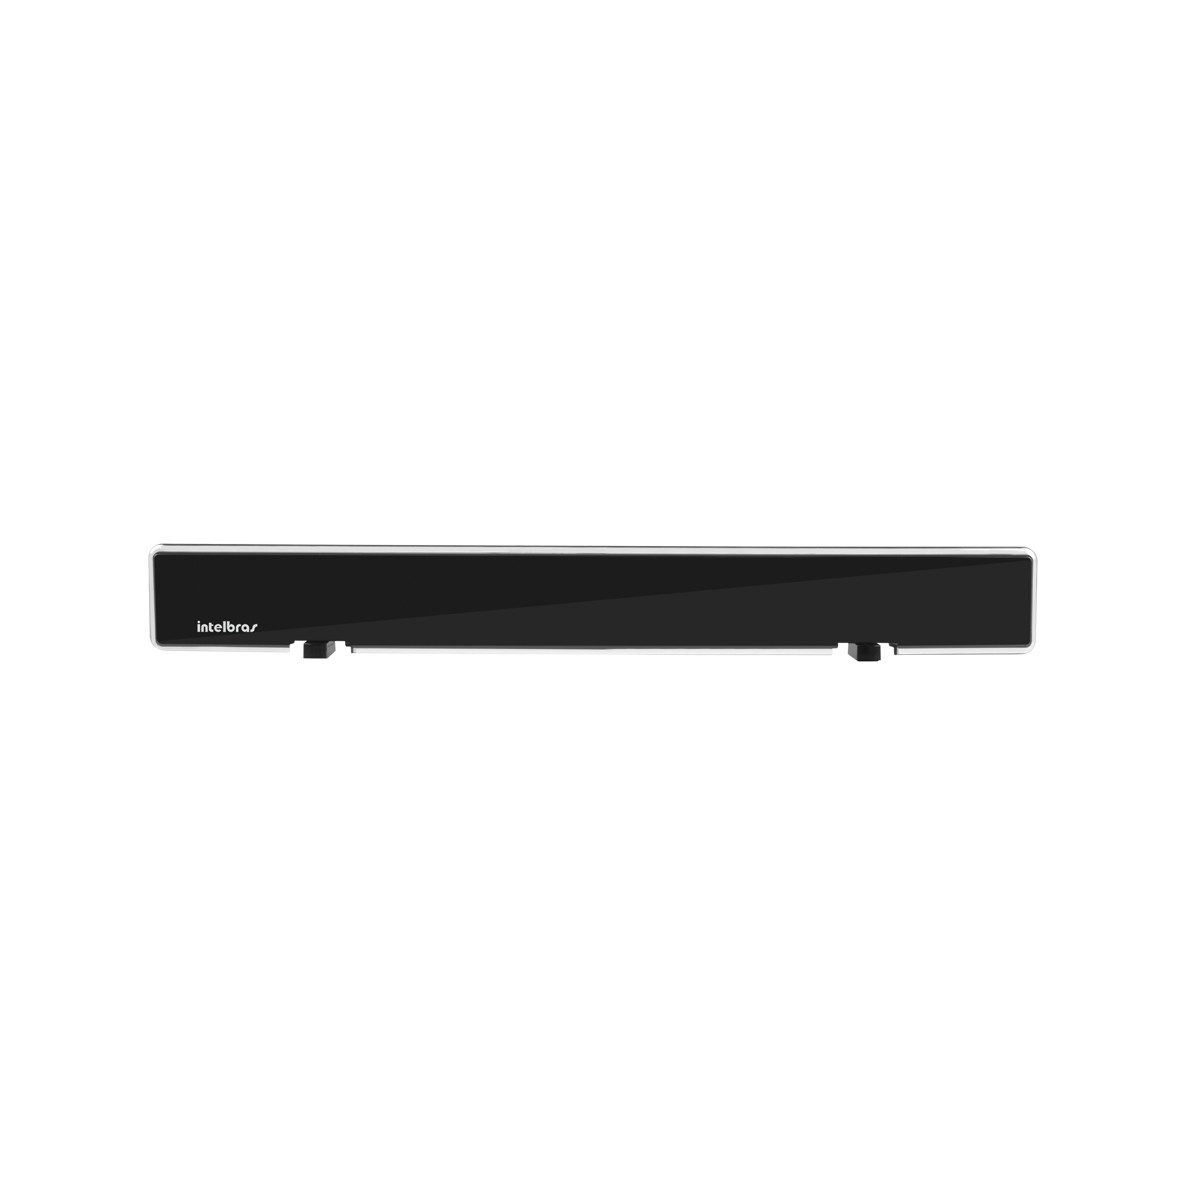 Antena de TV Interna Digital Ampl.Fm/UHF/HDTV AI 3100 Intelbras